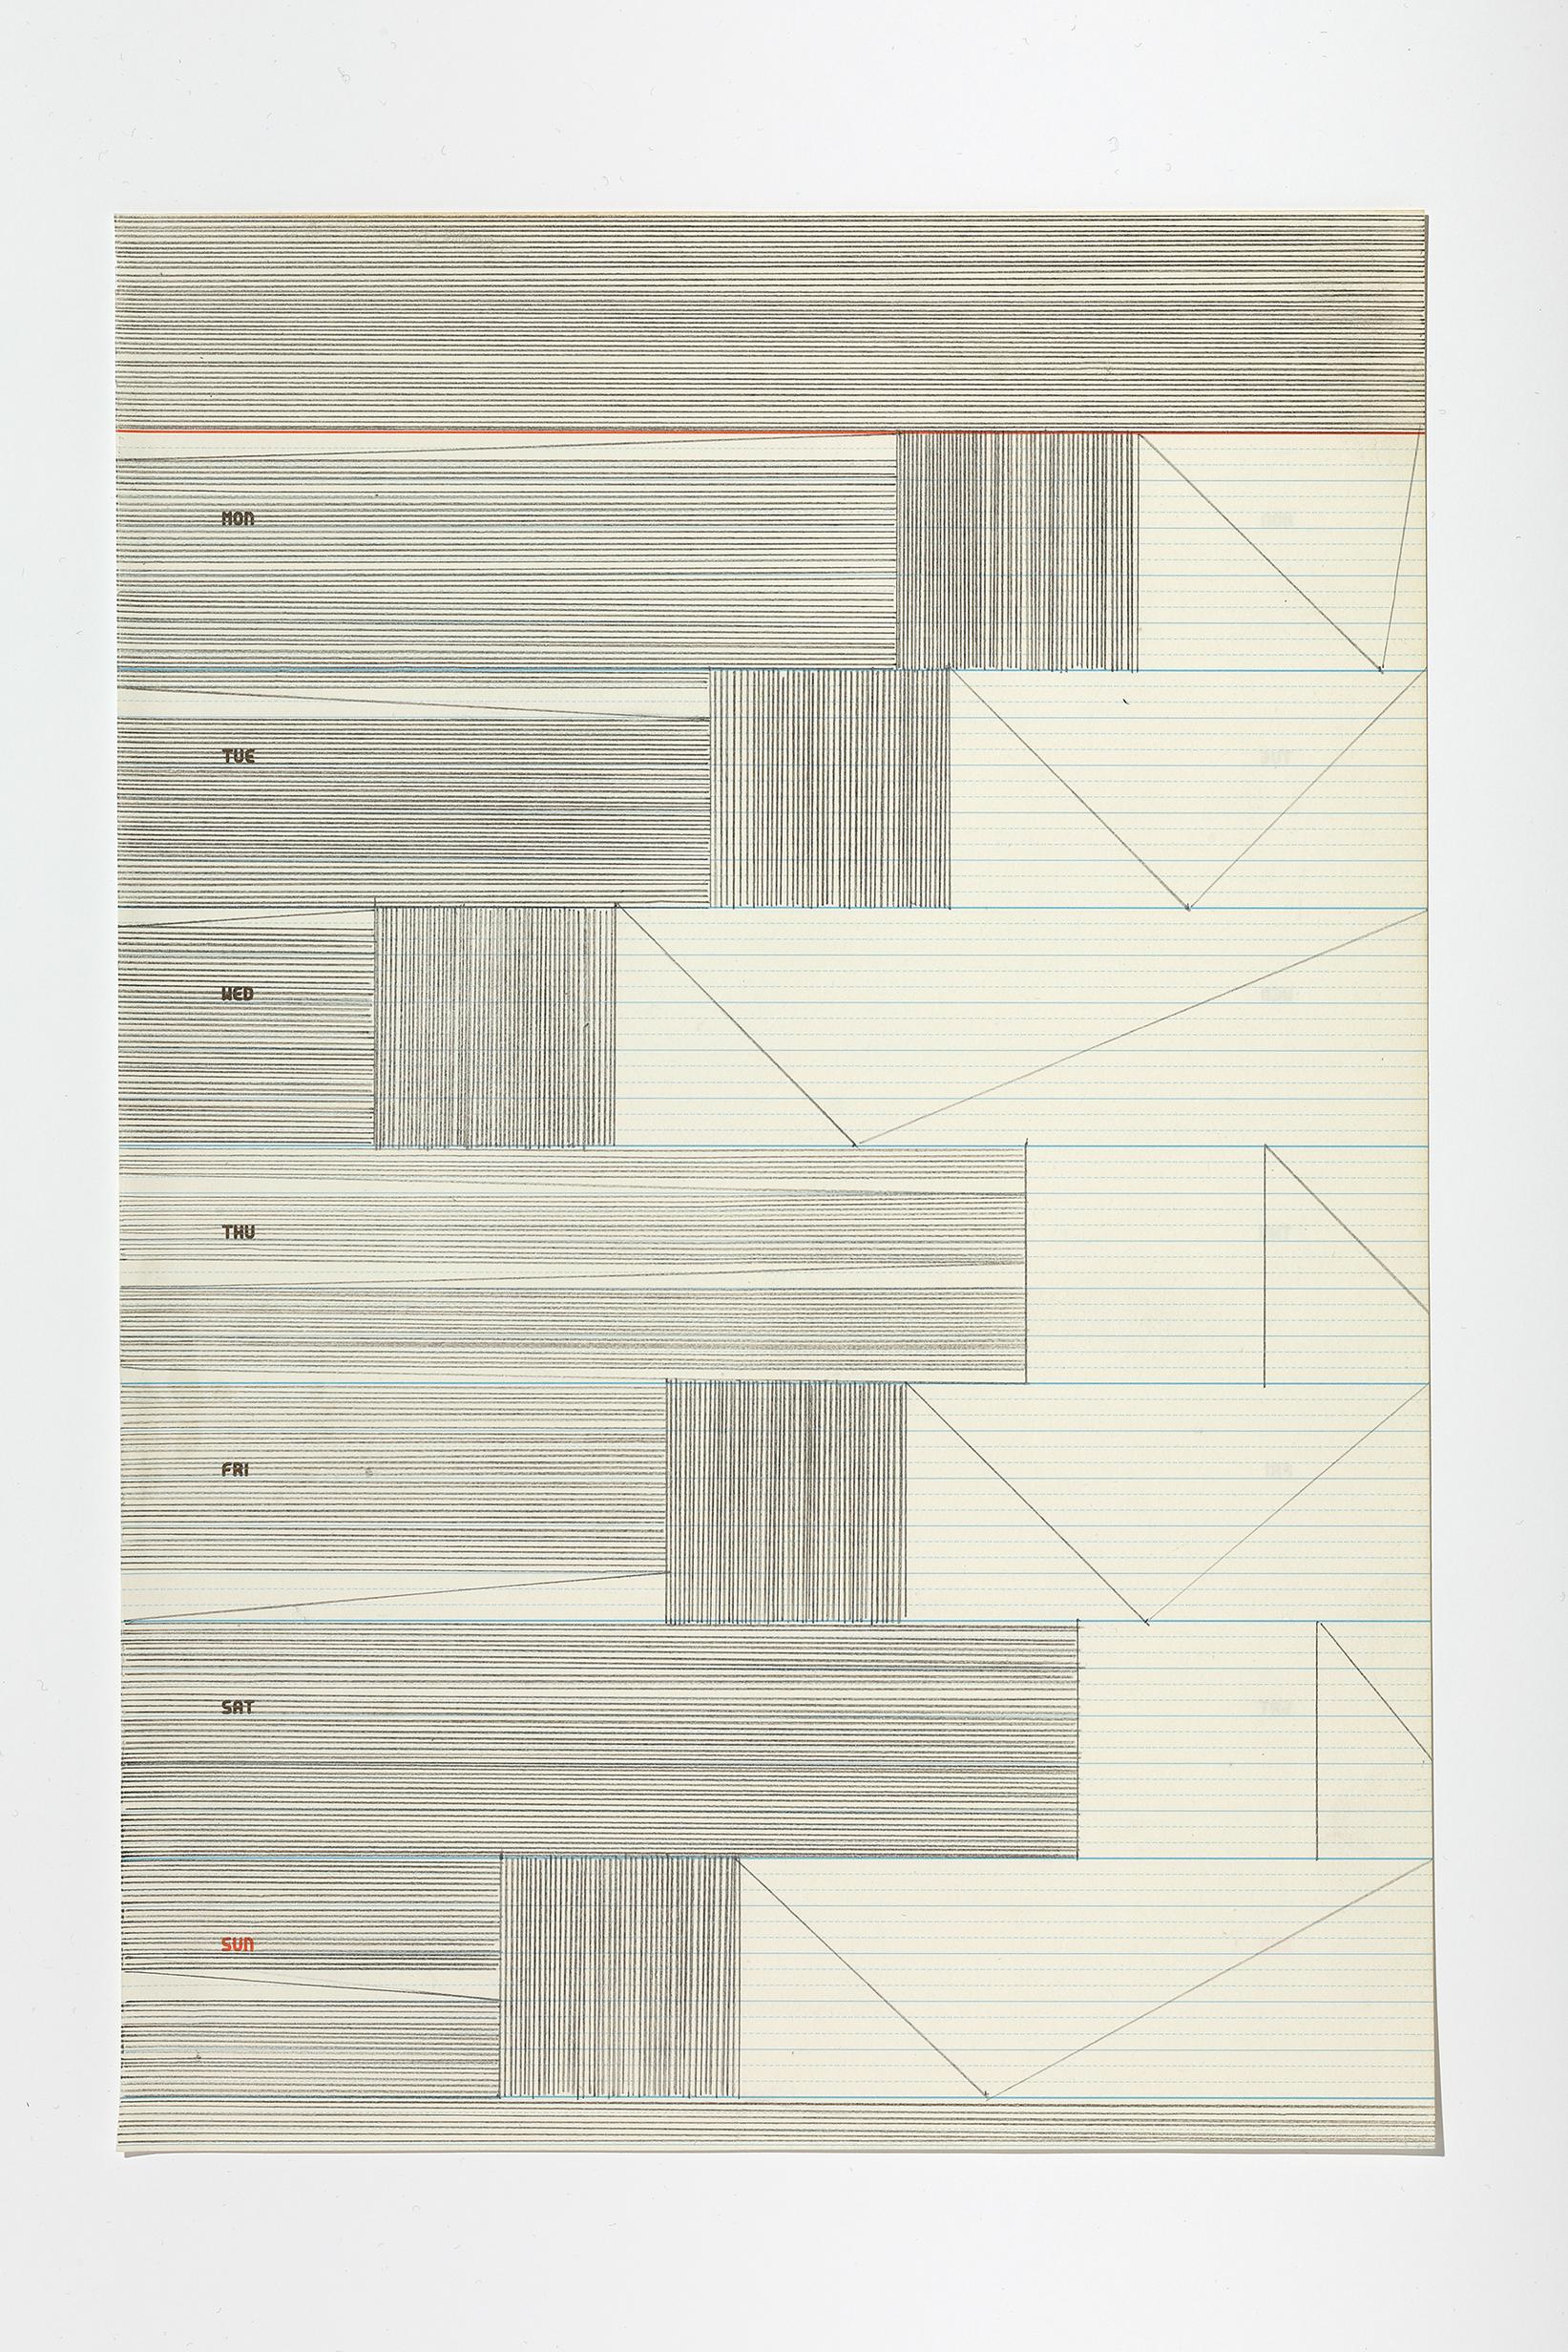 Haleh Redjaian  Six Weeks in Love (3/6) , 2017 graphite on paper, 28,5 x 19,5 cm